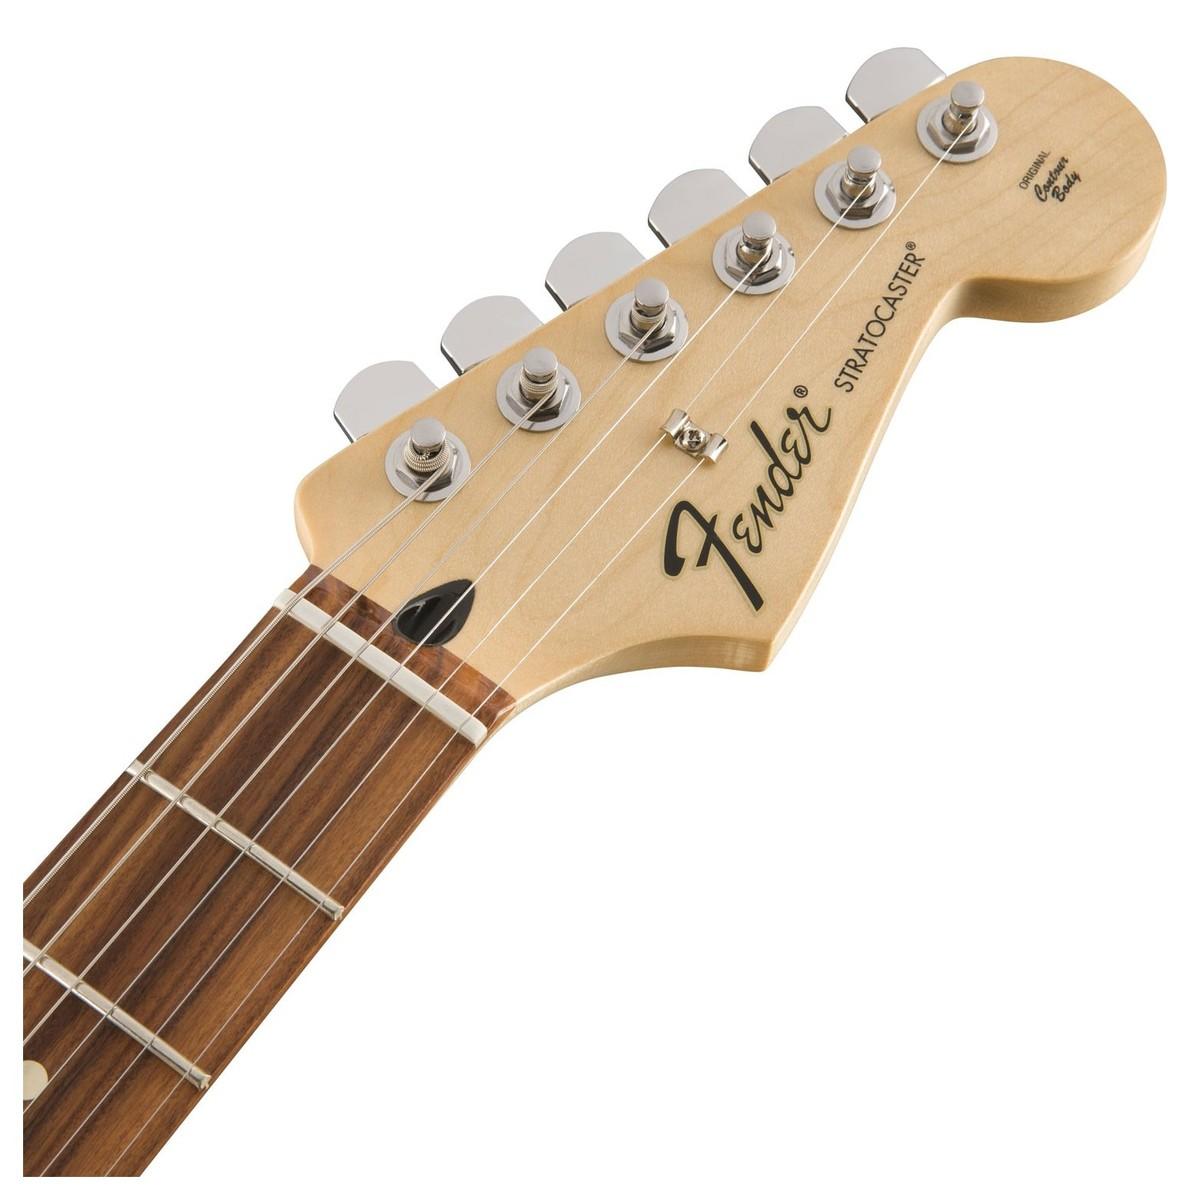 fender standard stratocaster pau ferro arctic white at gear4music. Black Bedroom Furniture Sets. Home Design Ideas